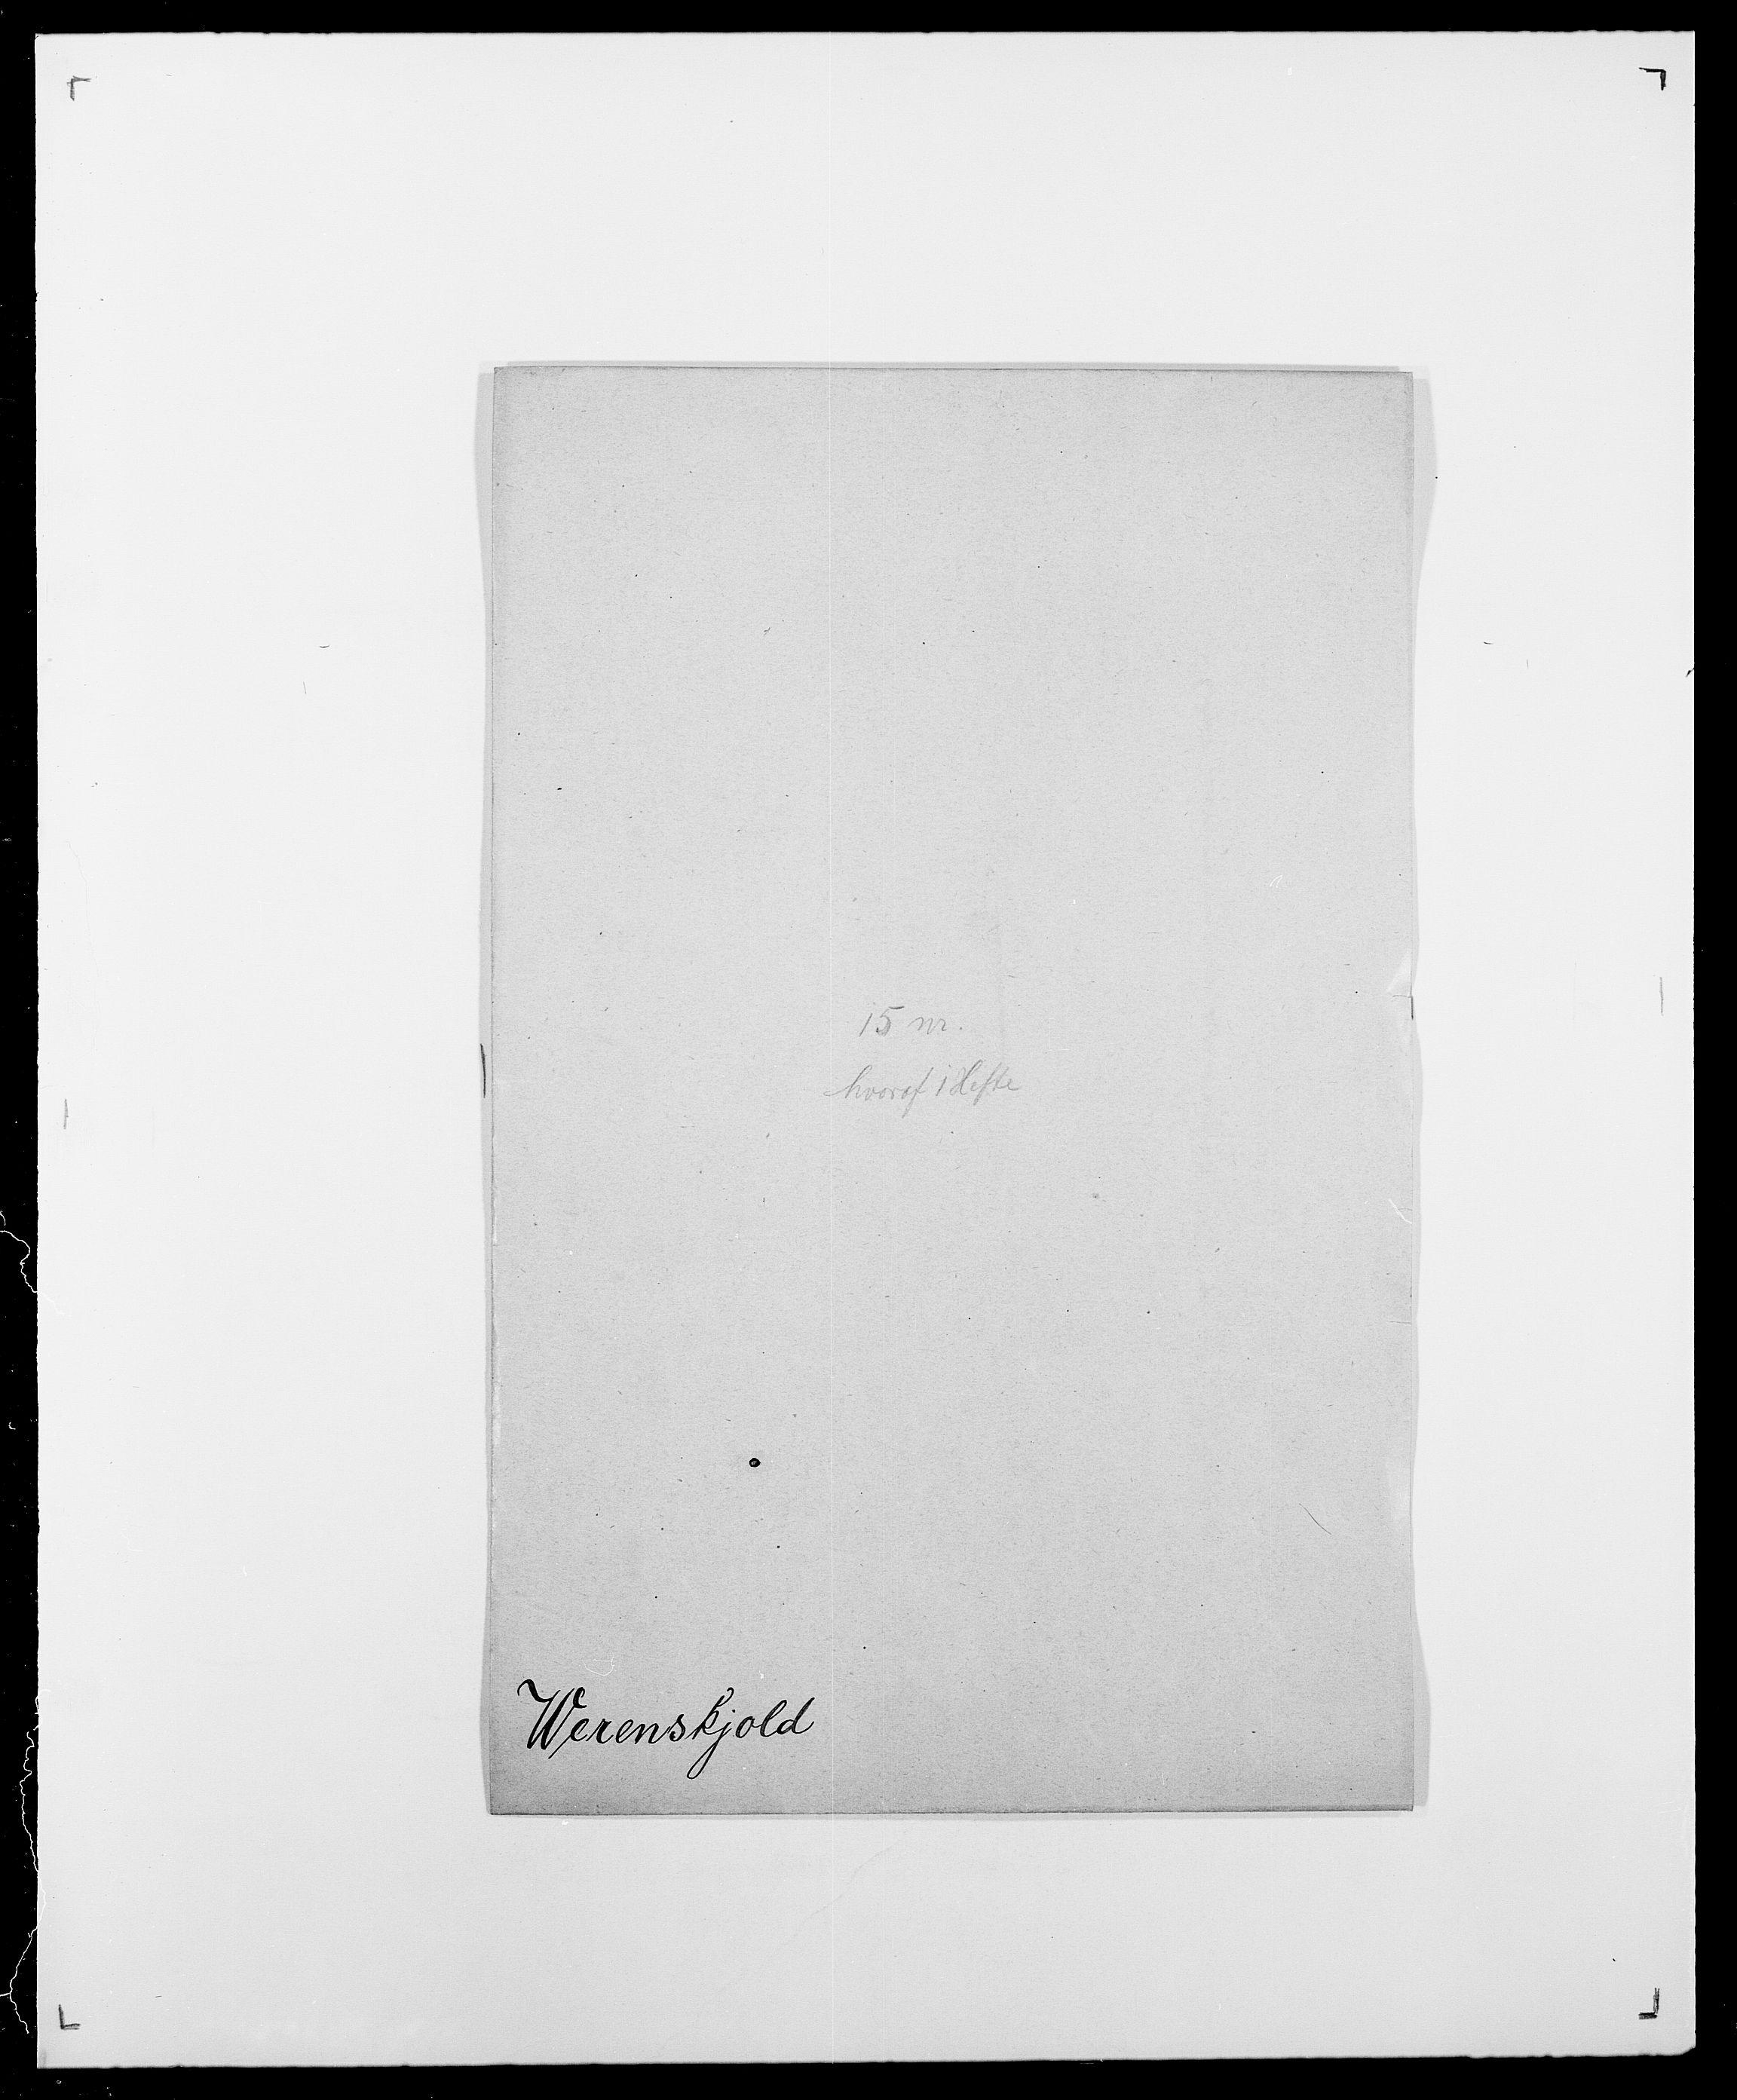 SAO, Delgobe, Charles Antoine - samling, D/Da/L0041: Vemmestad - Viker, s. 71